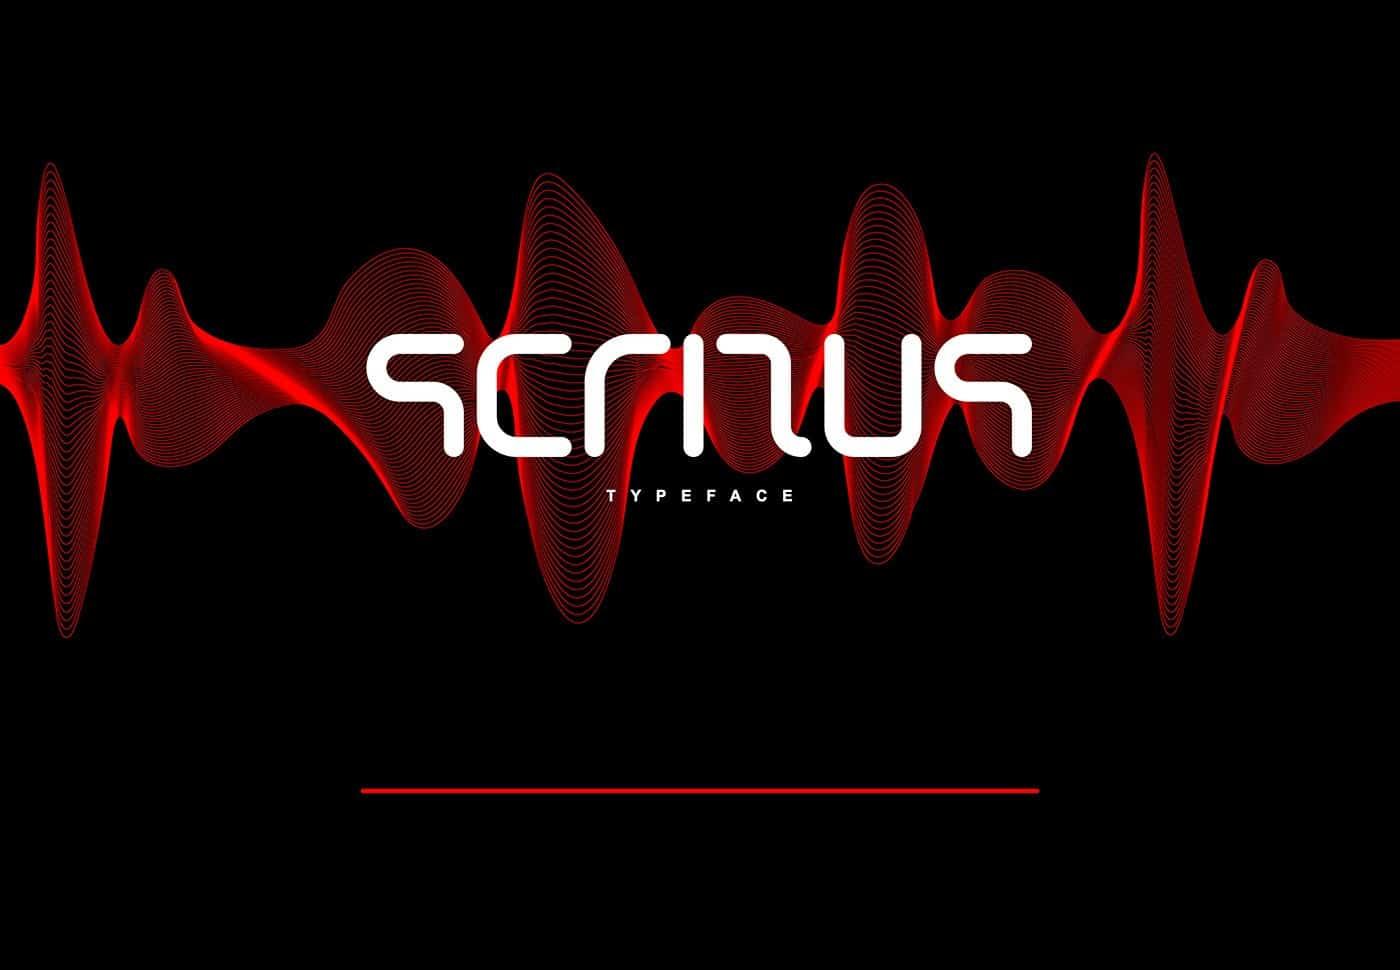 Download Scritus font (typeface)